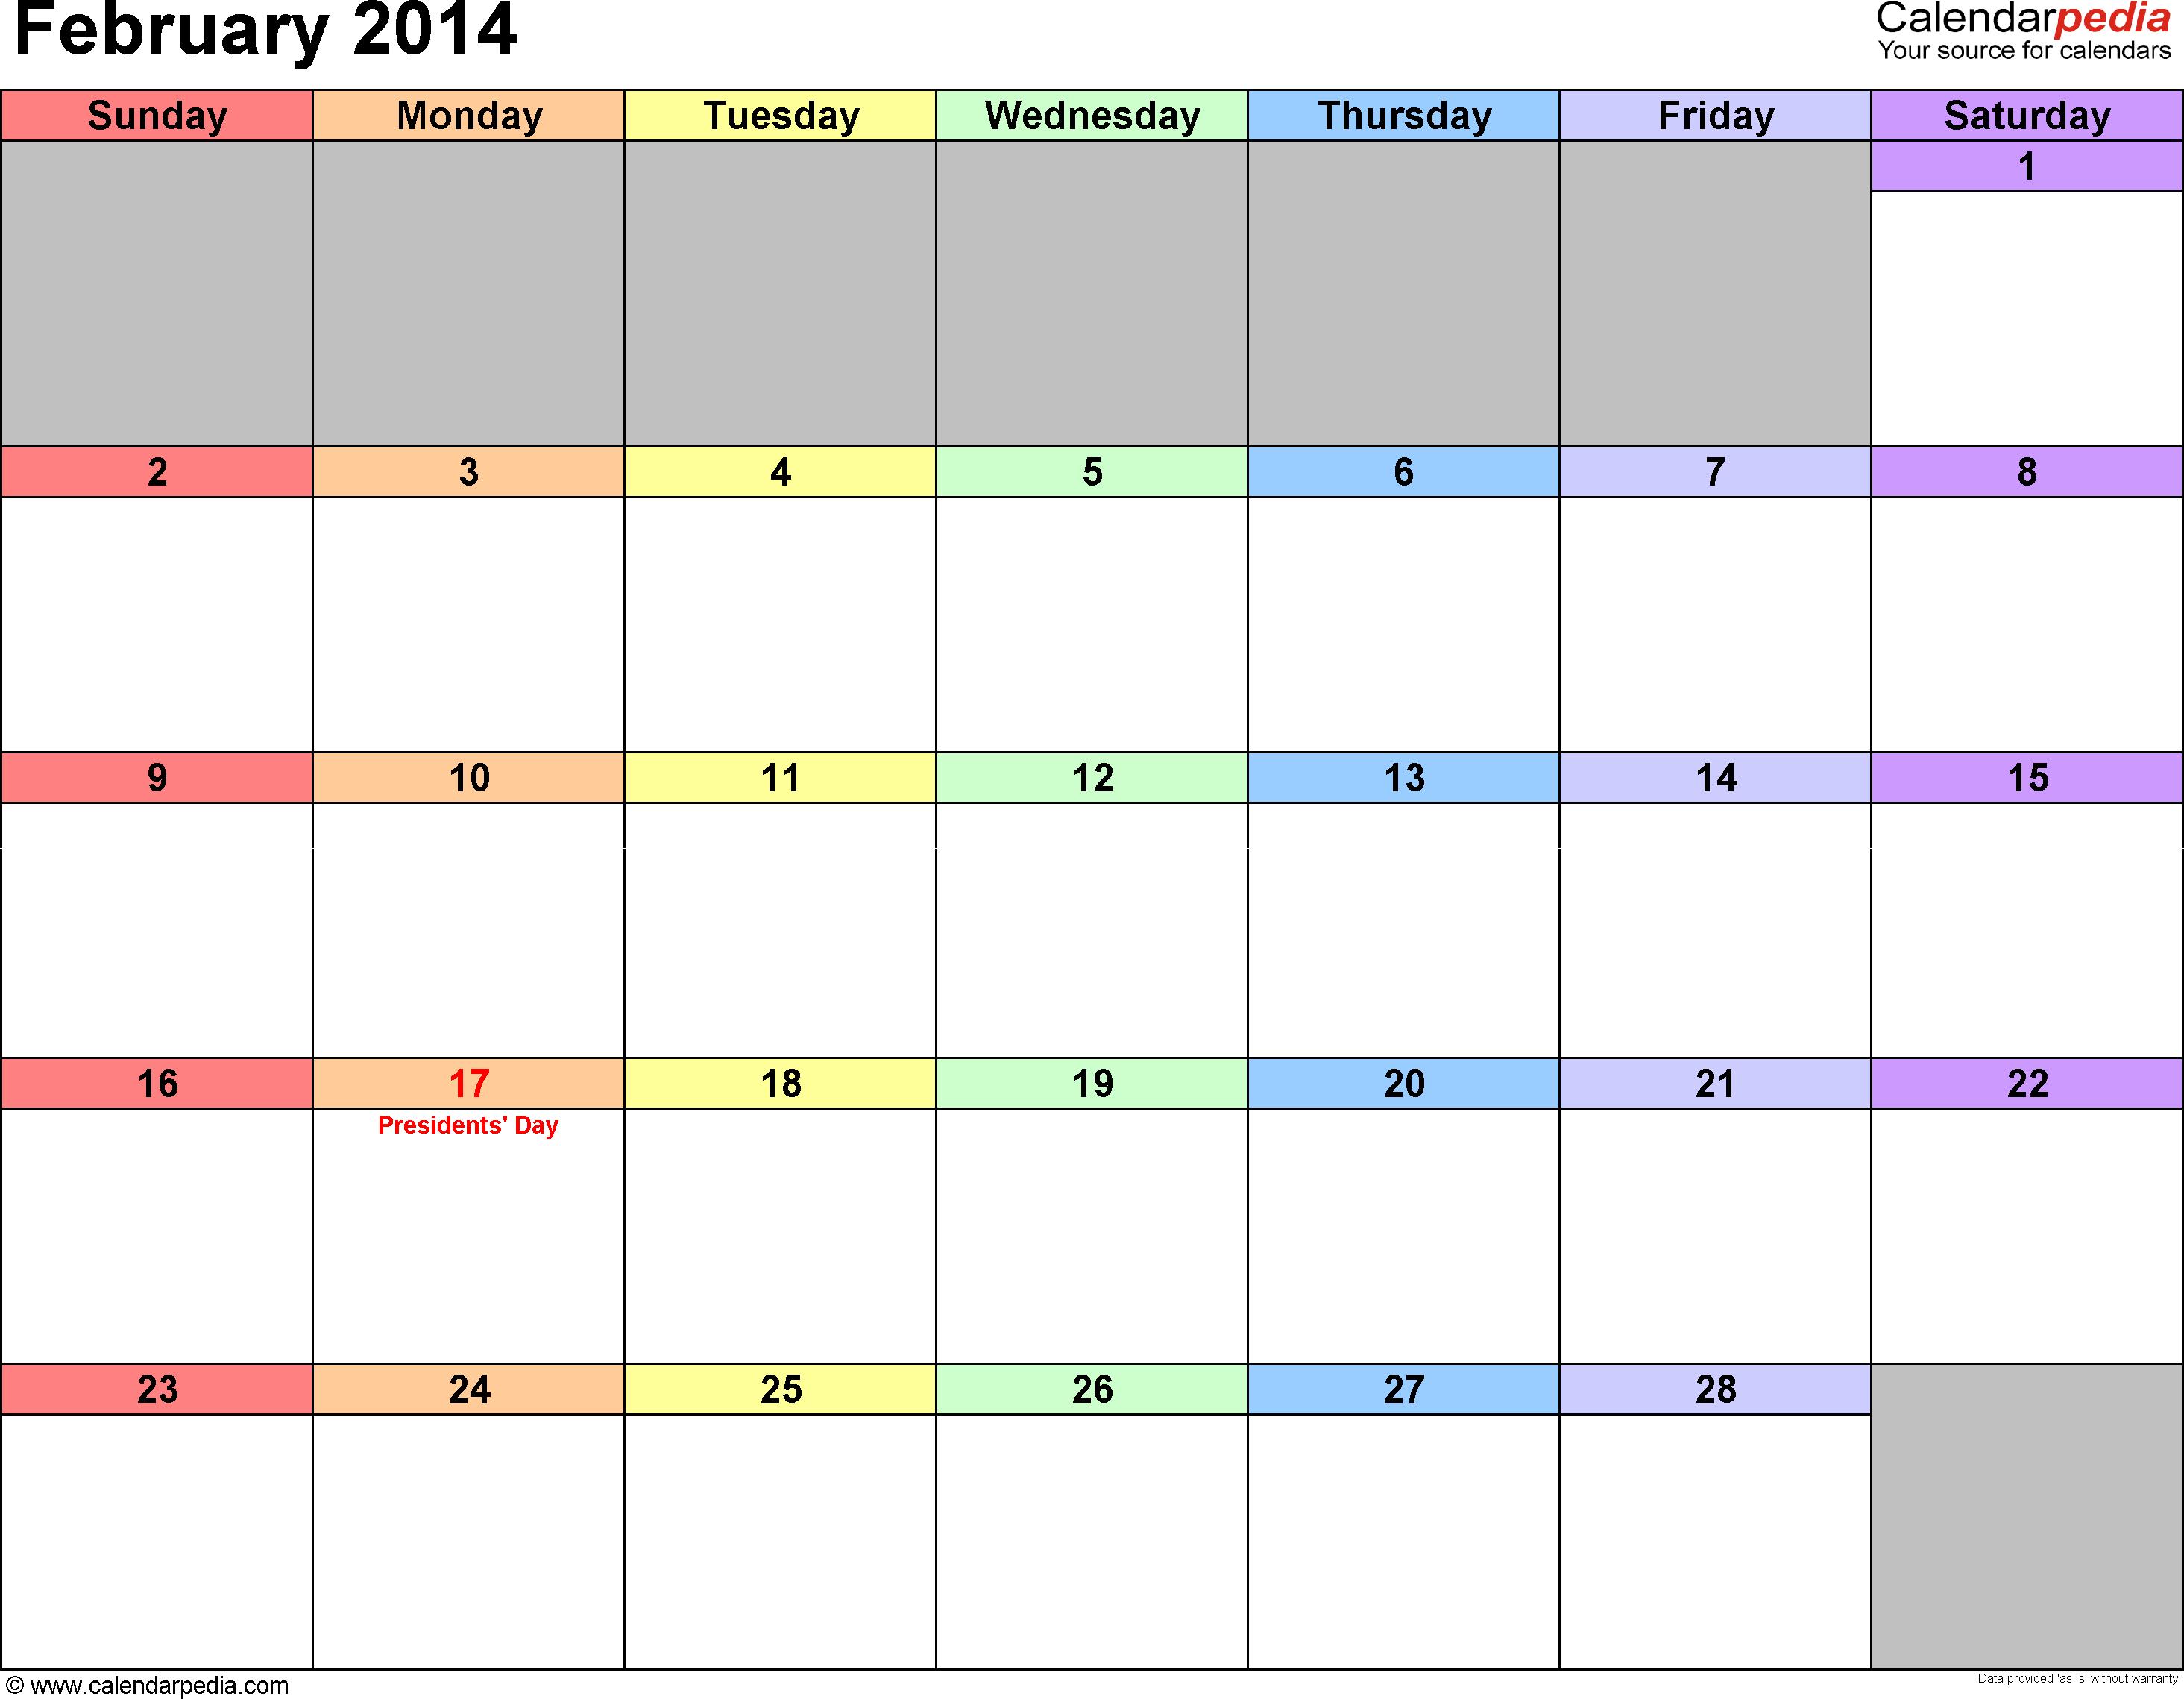 February 2014 calendar printable template